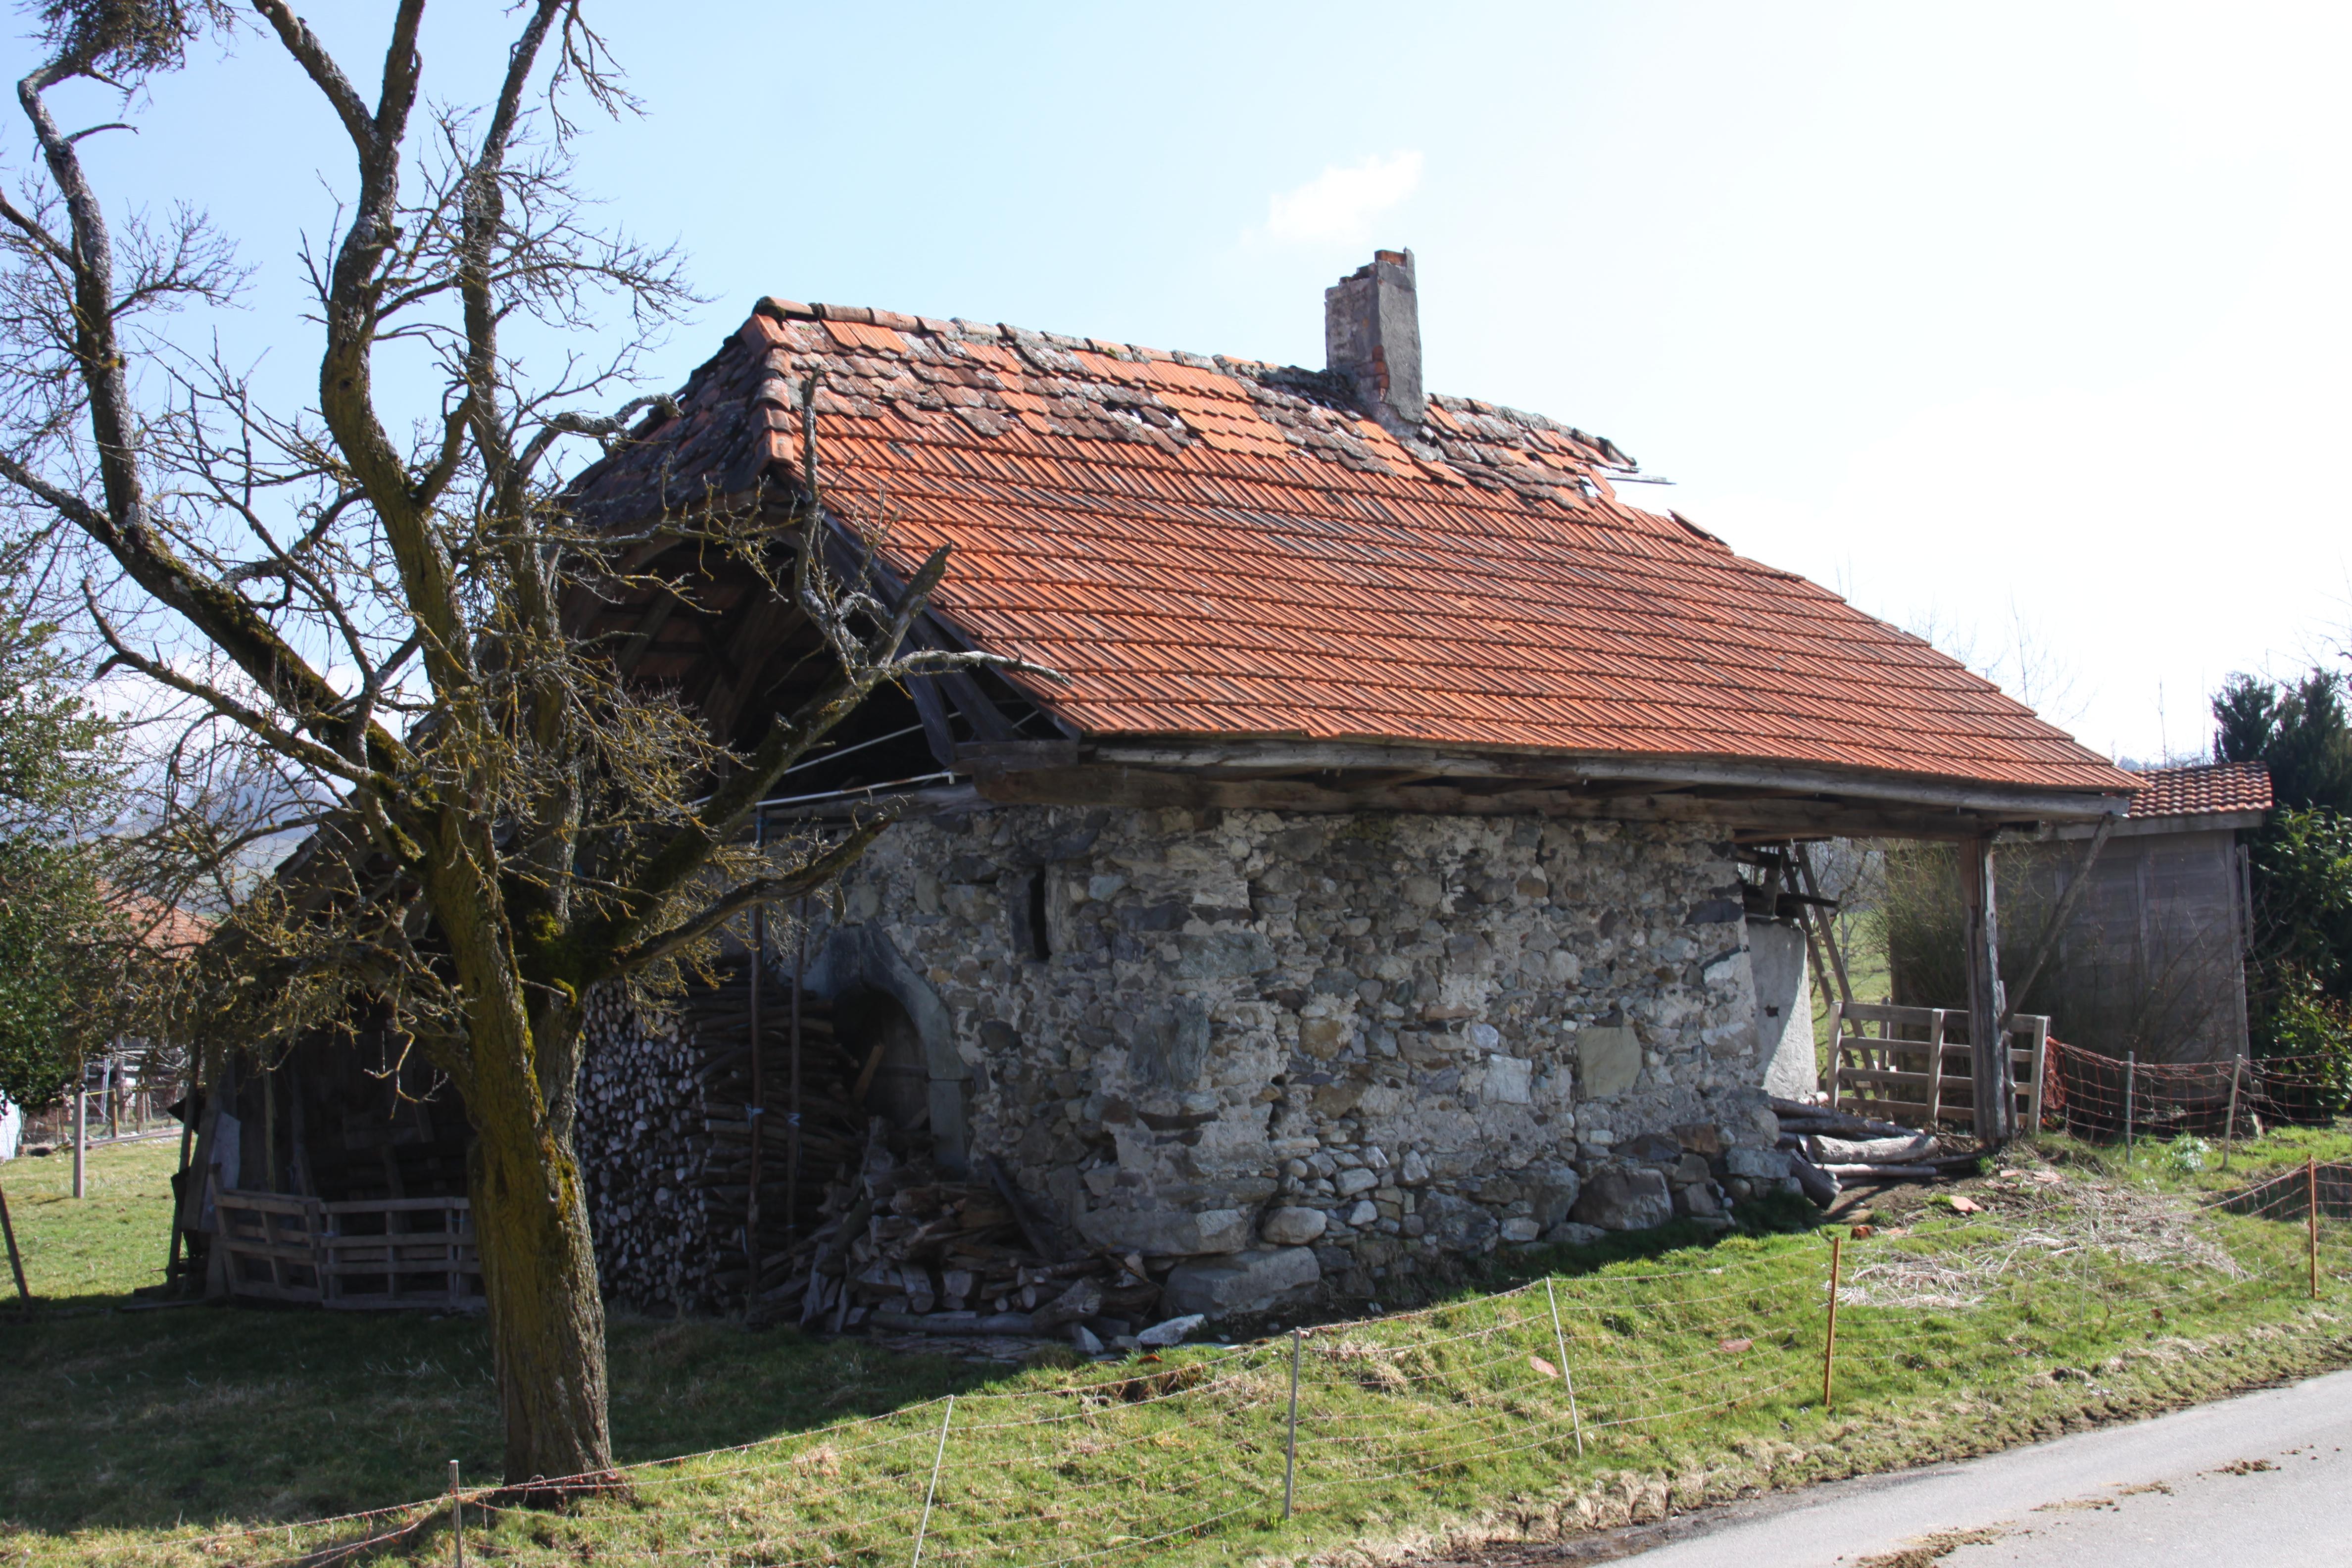 File:Ofenhaus Geretach 2B Mar 2011 jpg - Wikimedia Commons